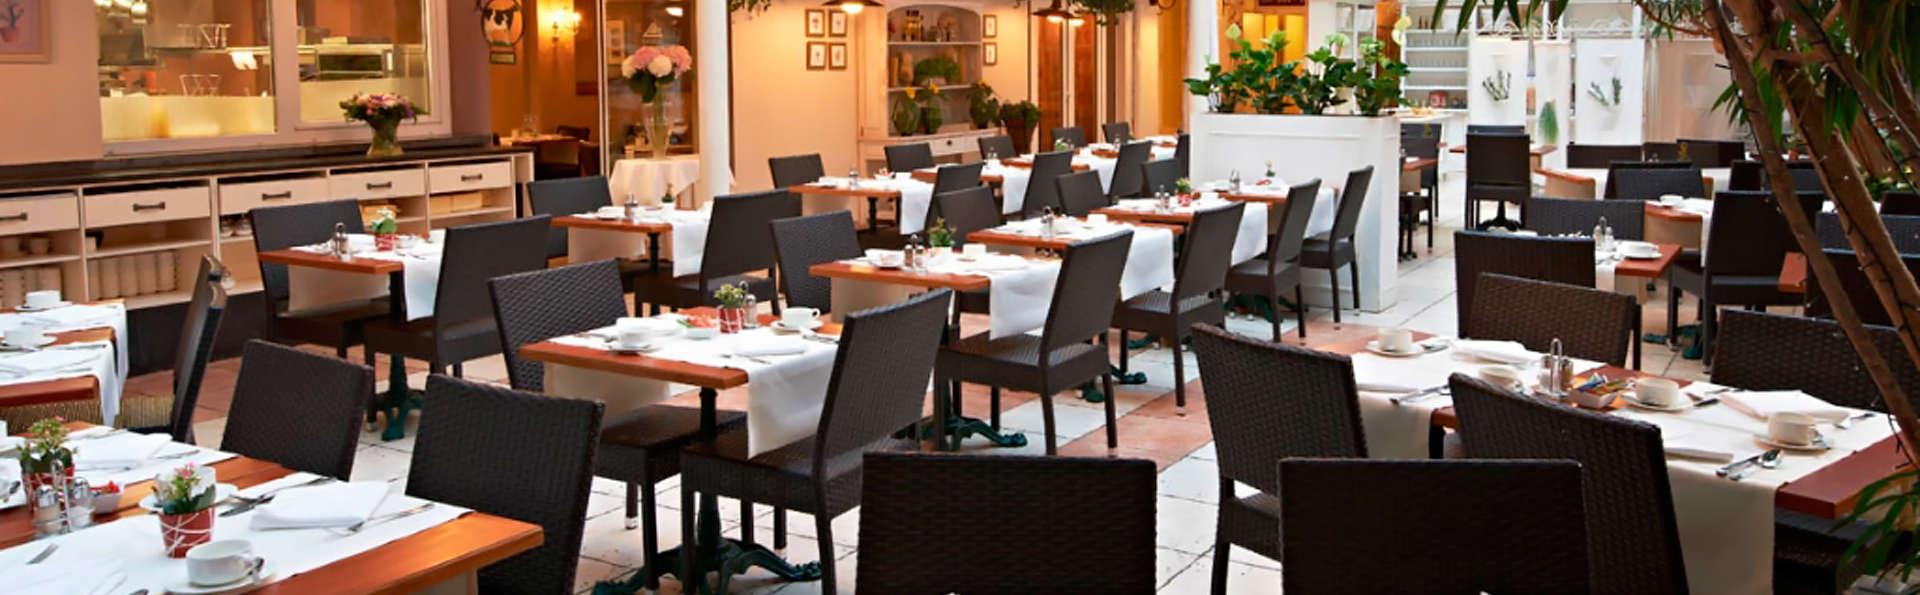 Leopold Hotel Brussel EU - EDIT_restaurant2.jpg